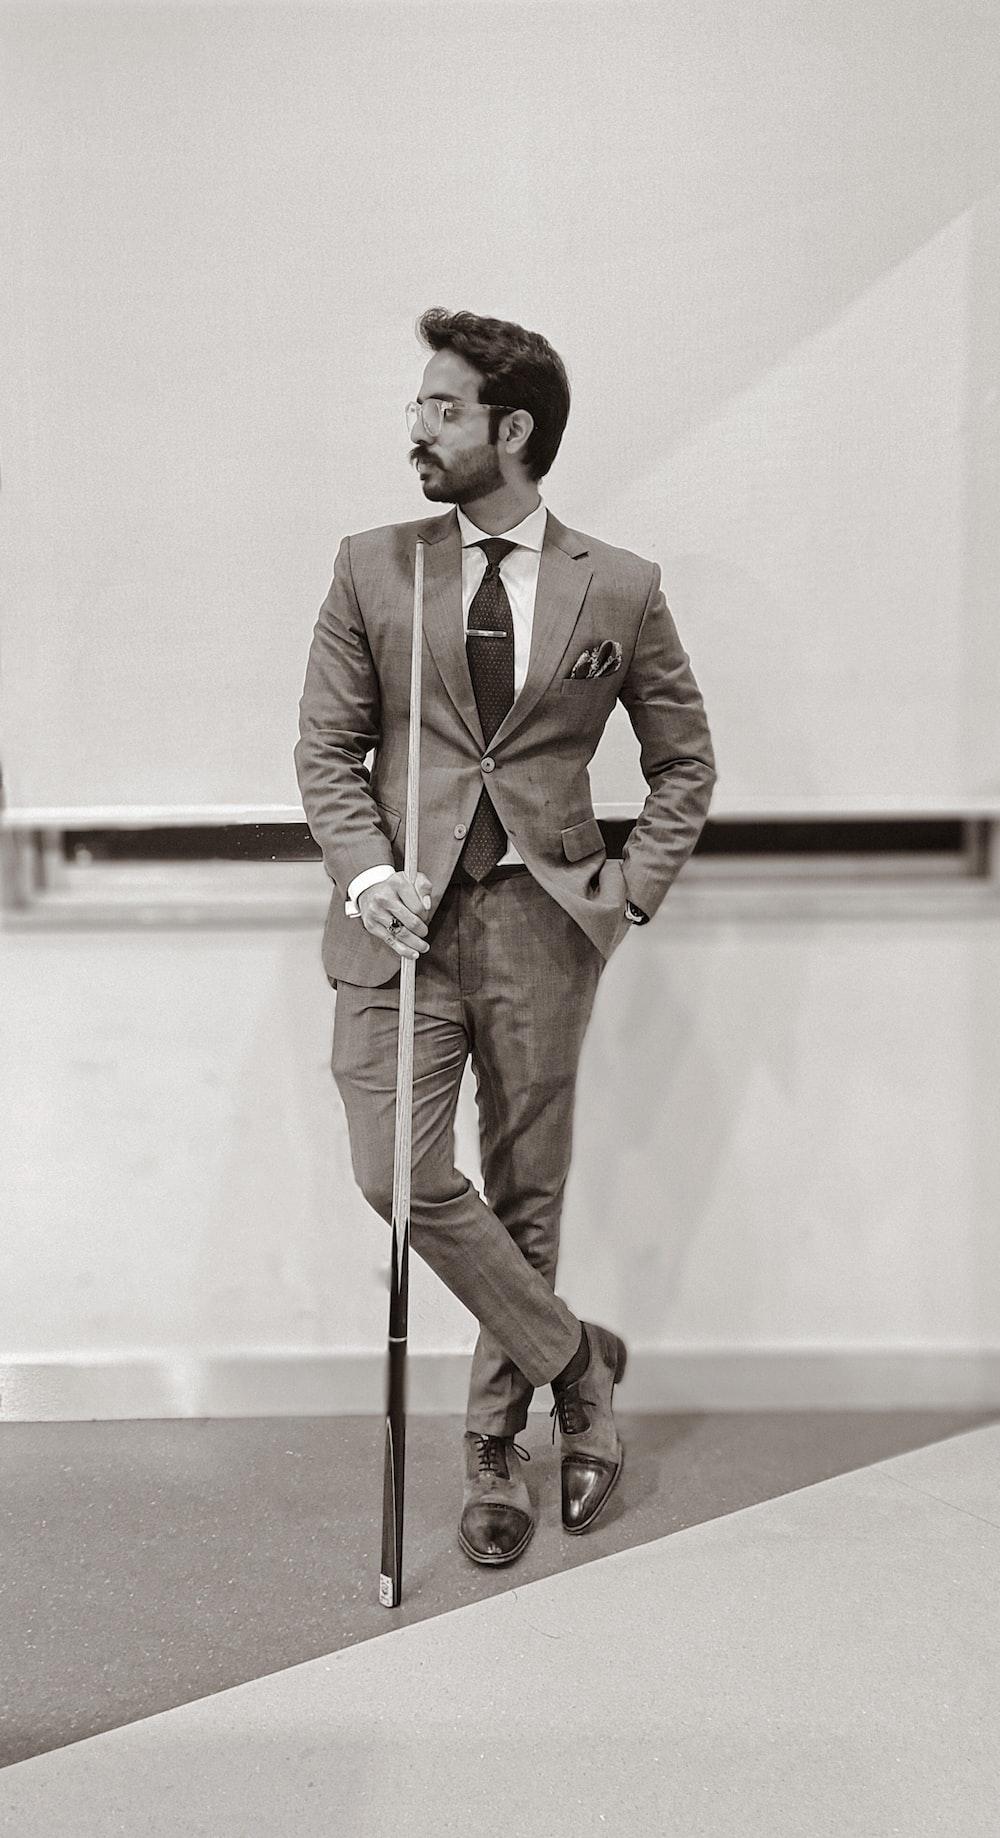 man in brown suit holding walking stick